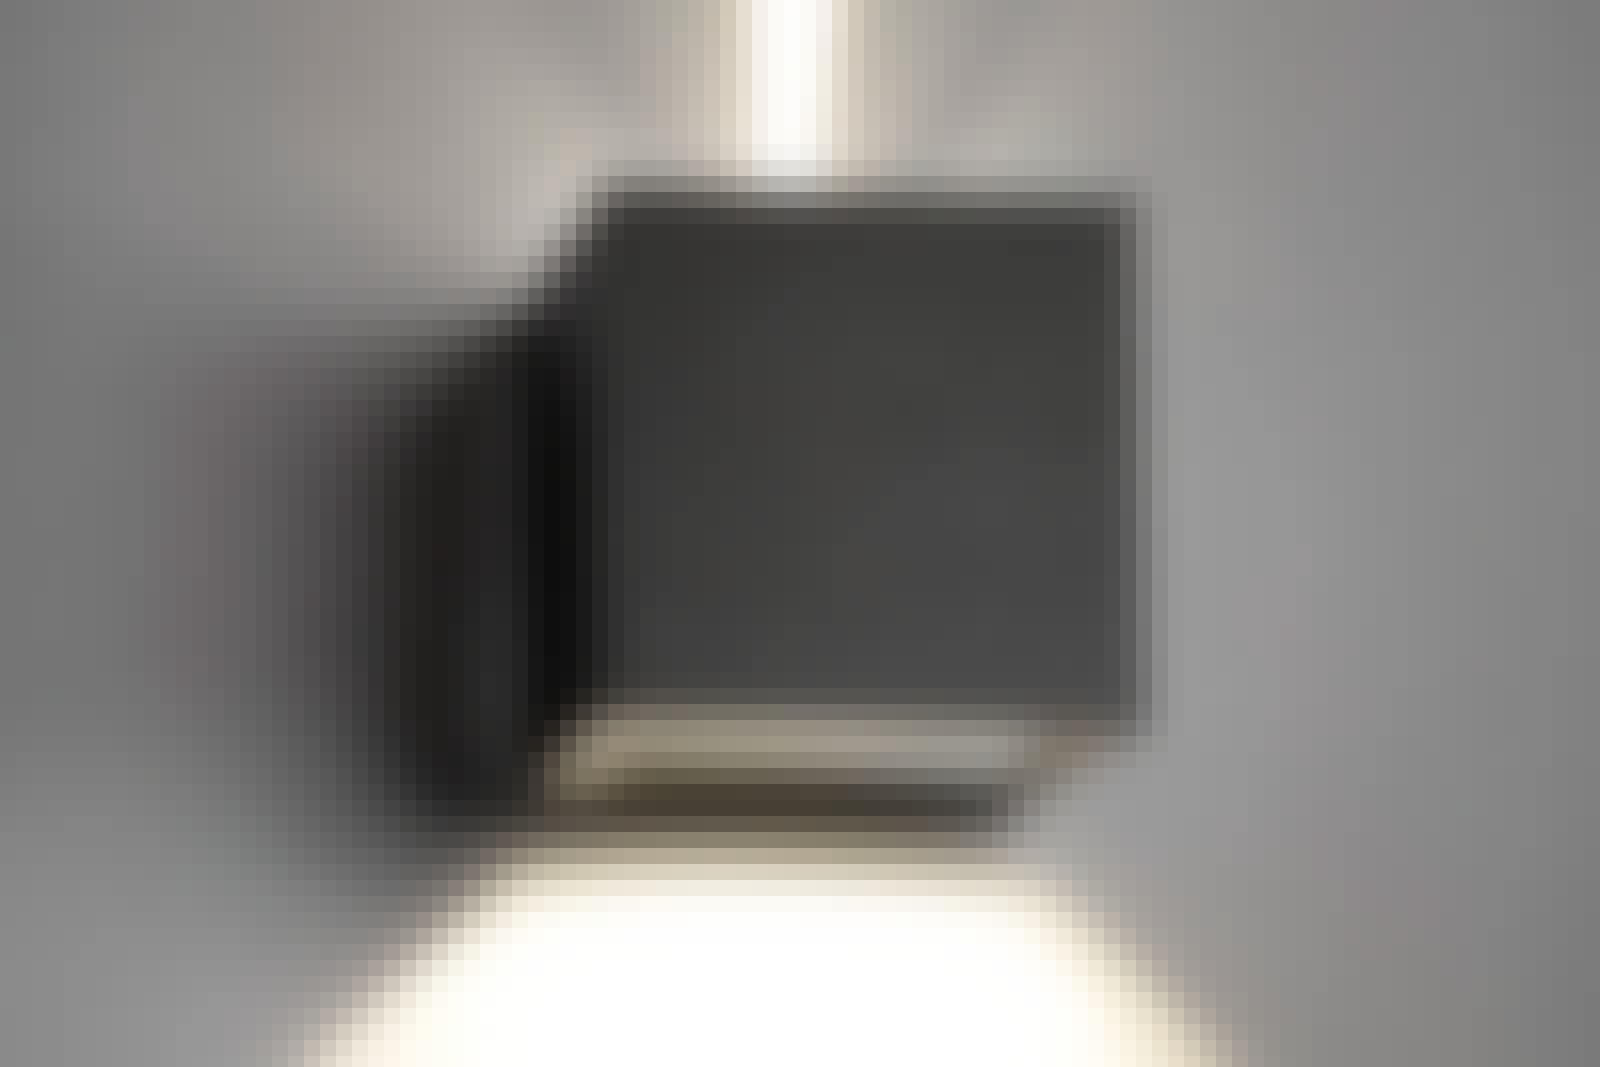 Ulkovalot: Cube led. Design-seinävalo